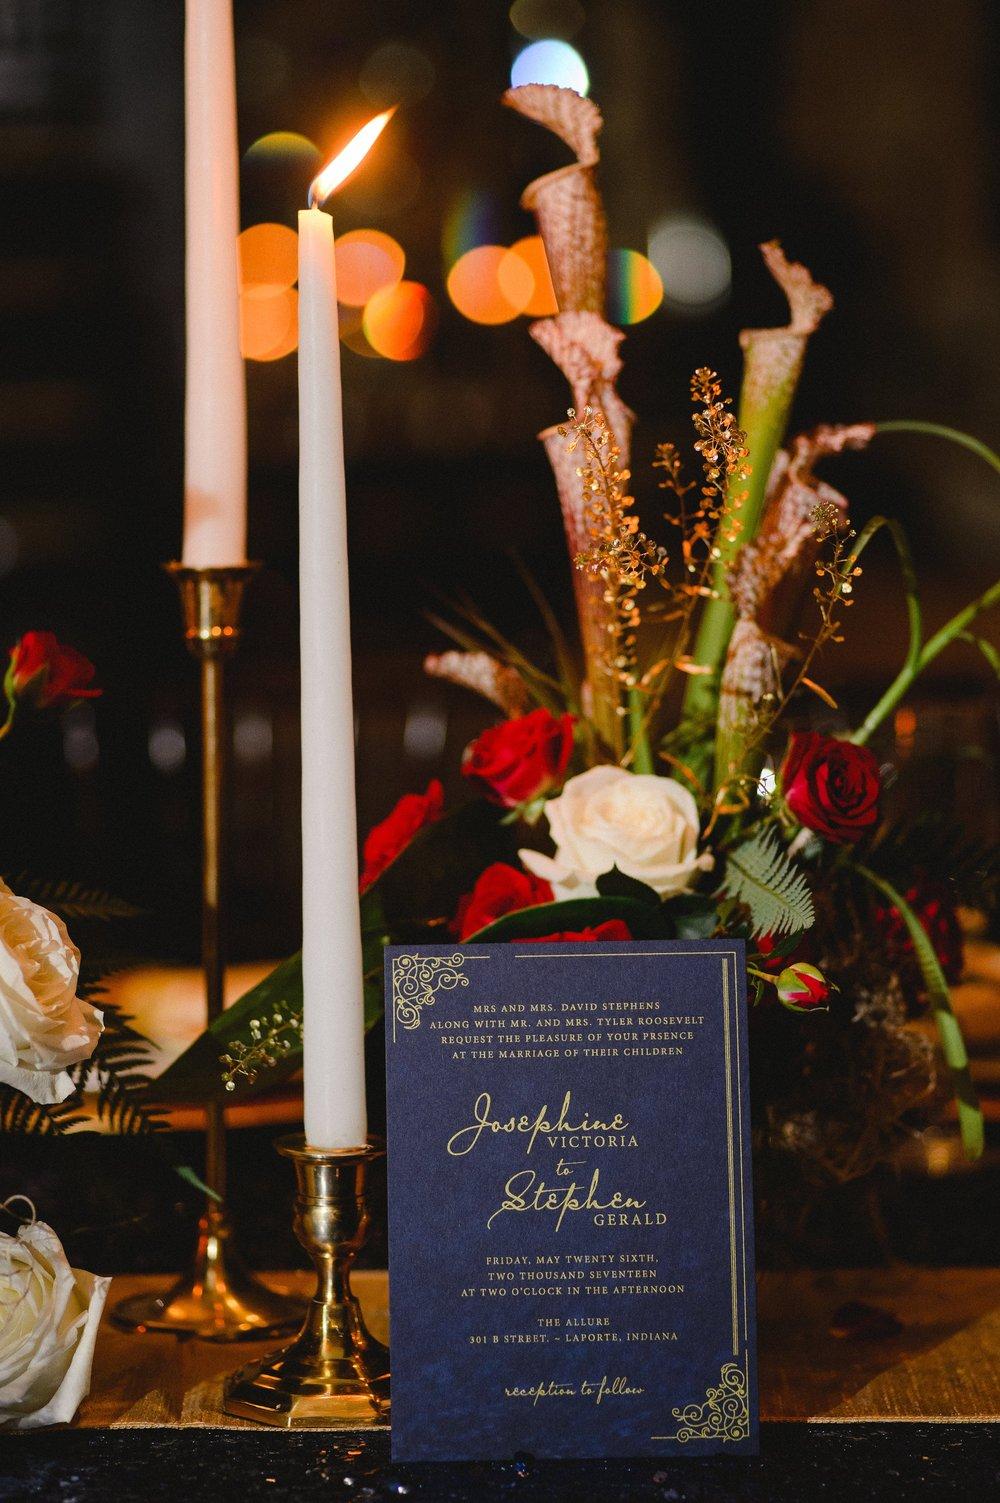 KatherineMurrayPhotography_StyledShoot_Wedding_BeautyAndTheBeast_ATaleAsOldAsTime_theAllure_LaPorteIndiana00246-min.jpg